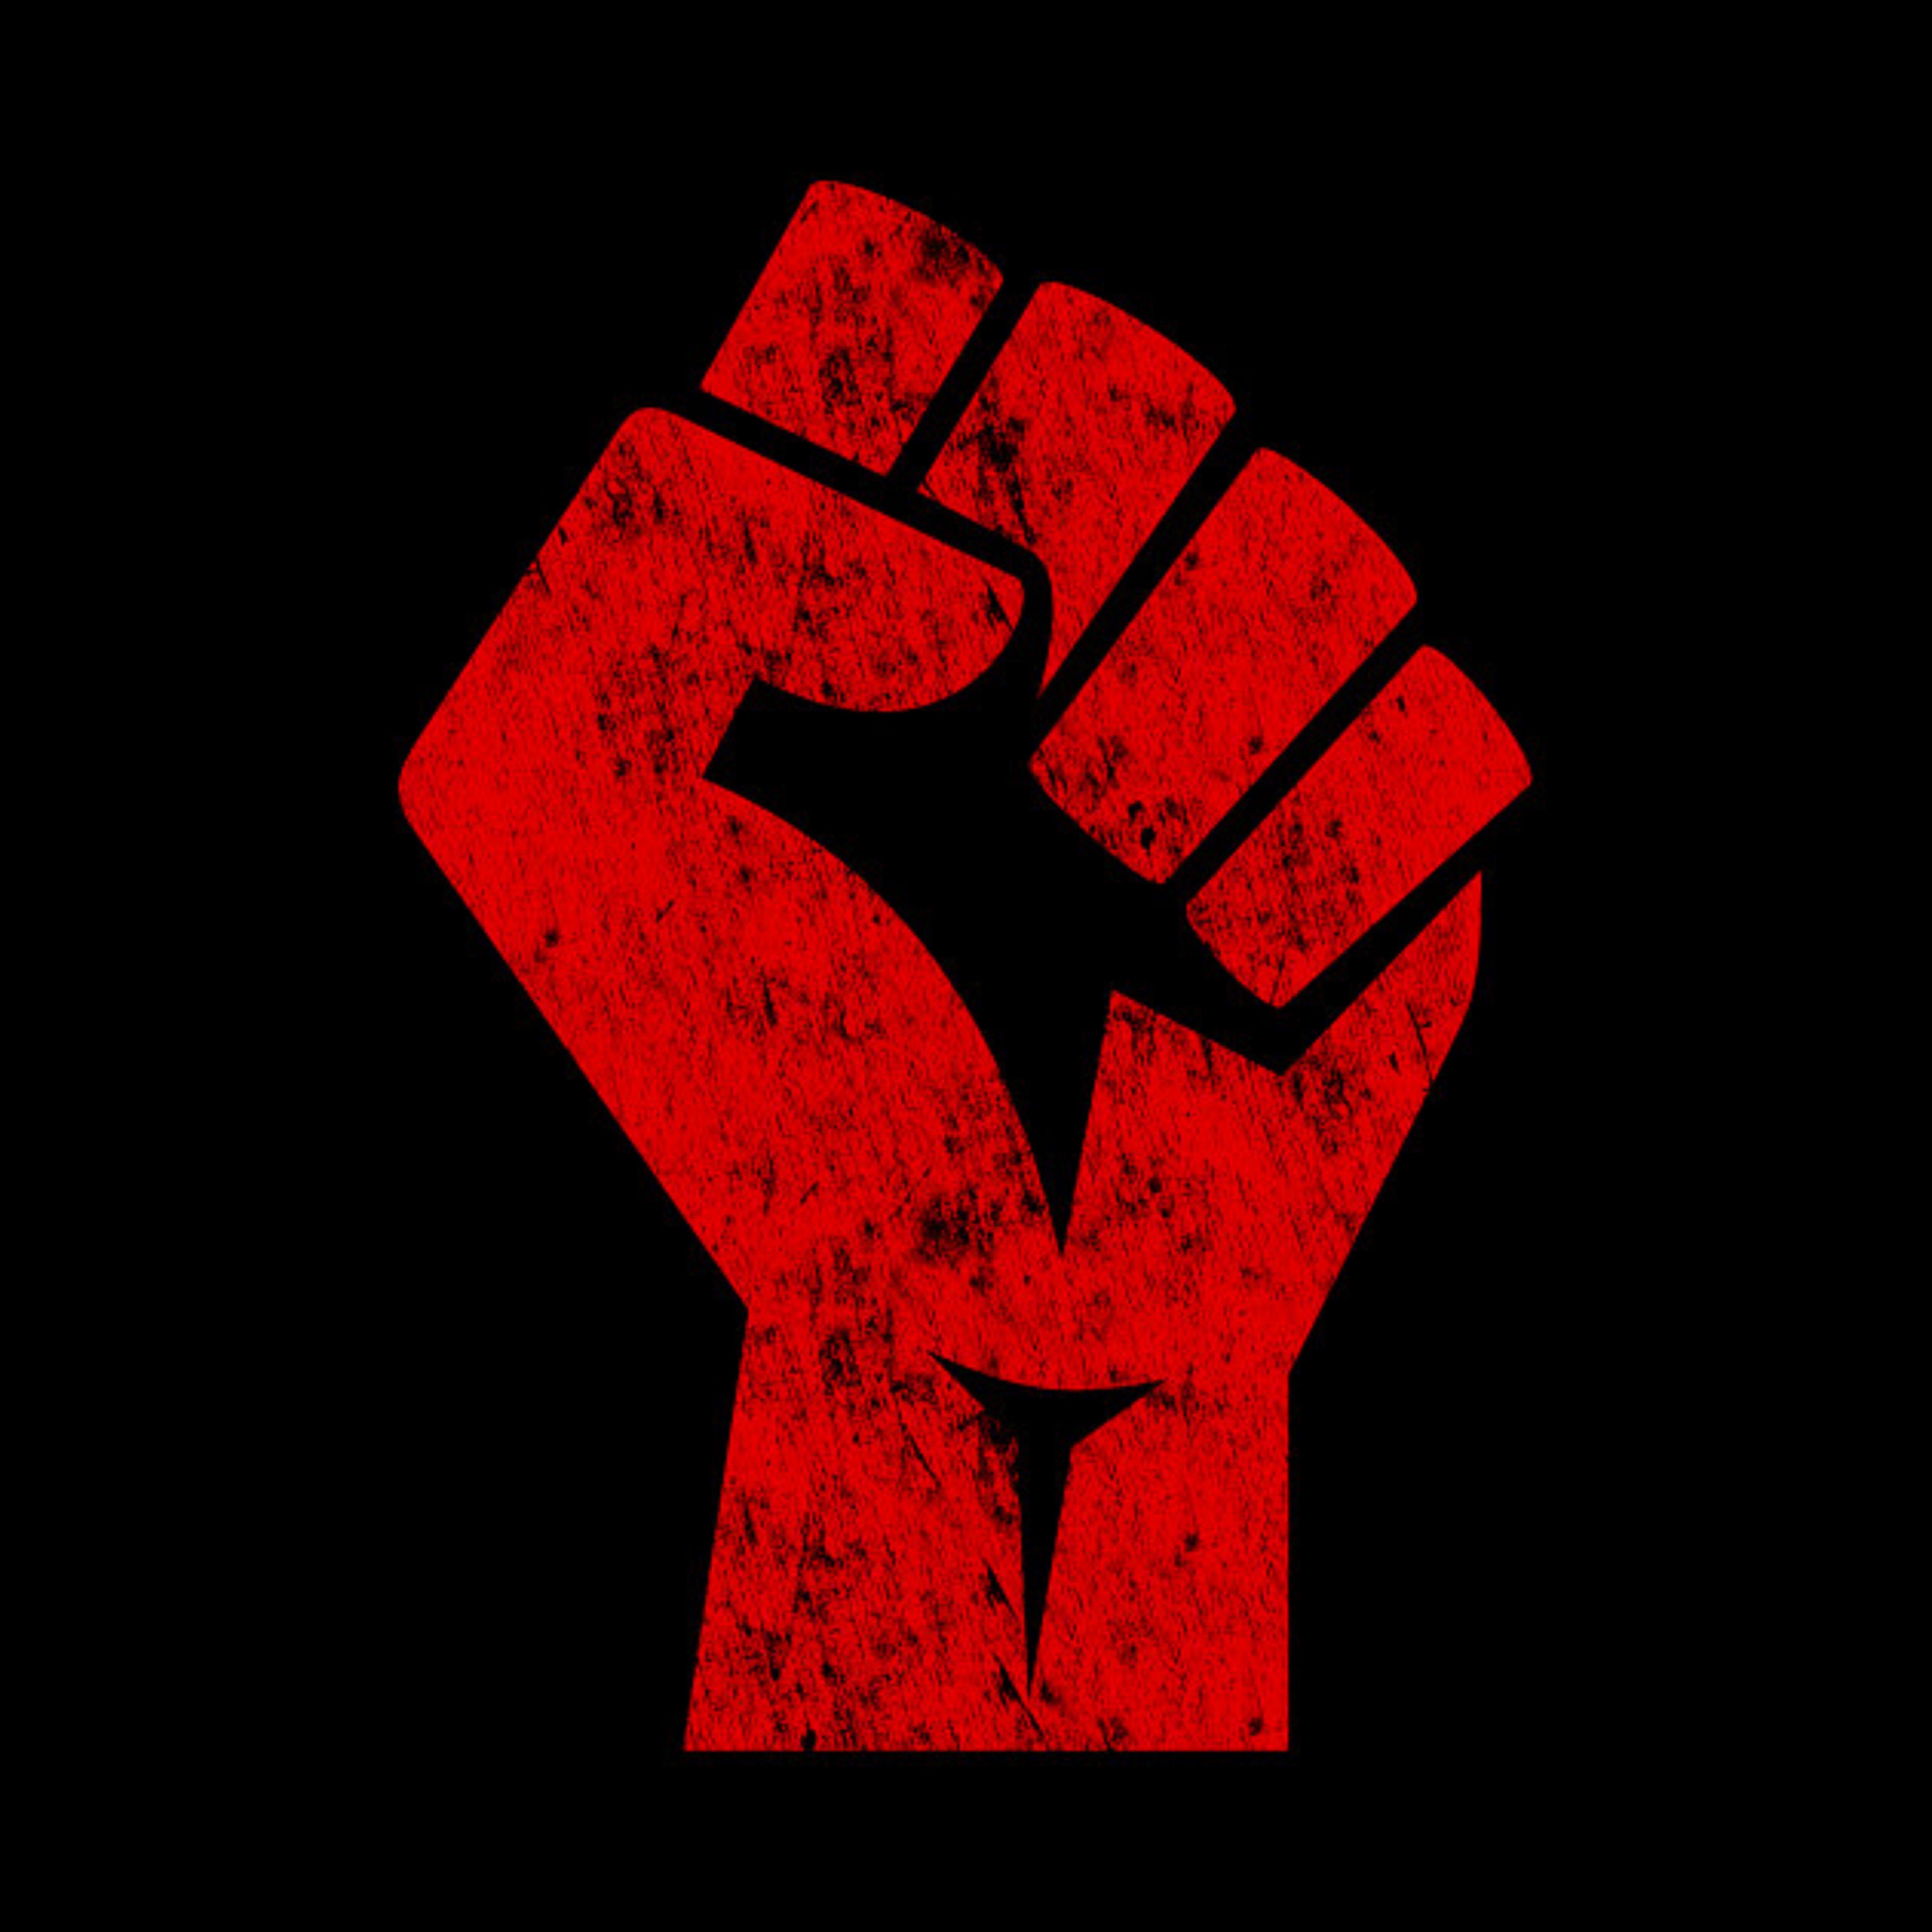 'Socialist Fist ' Premium TShirt by Galahad221 in 2020